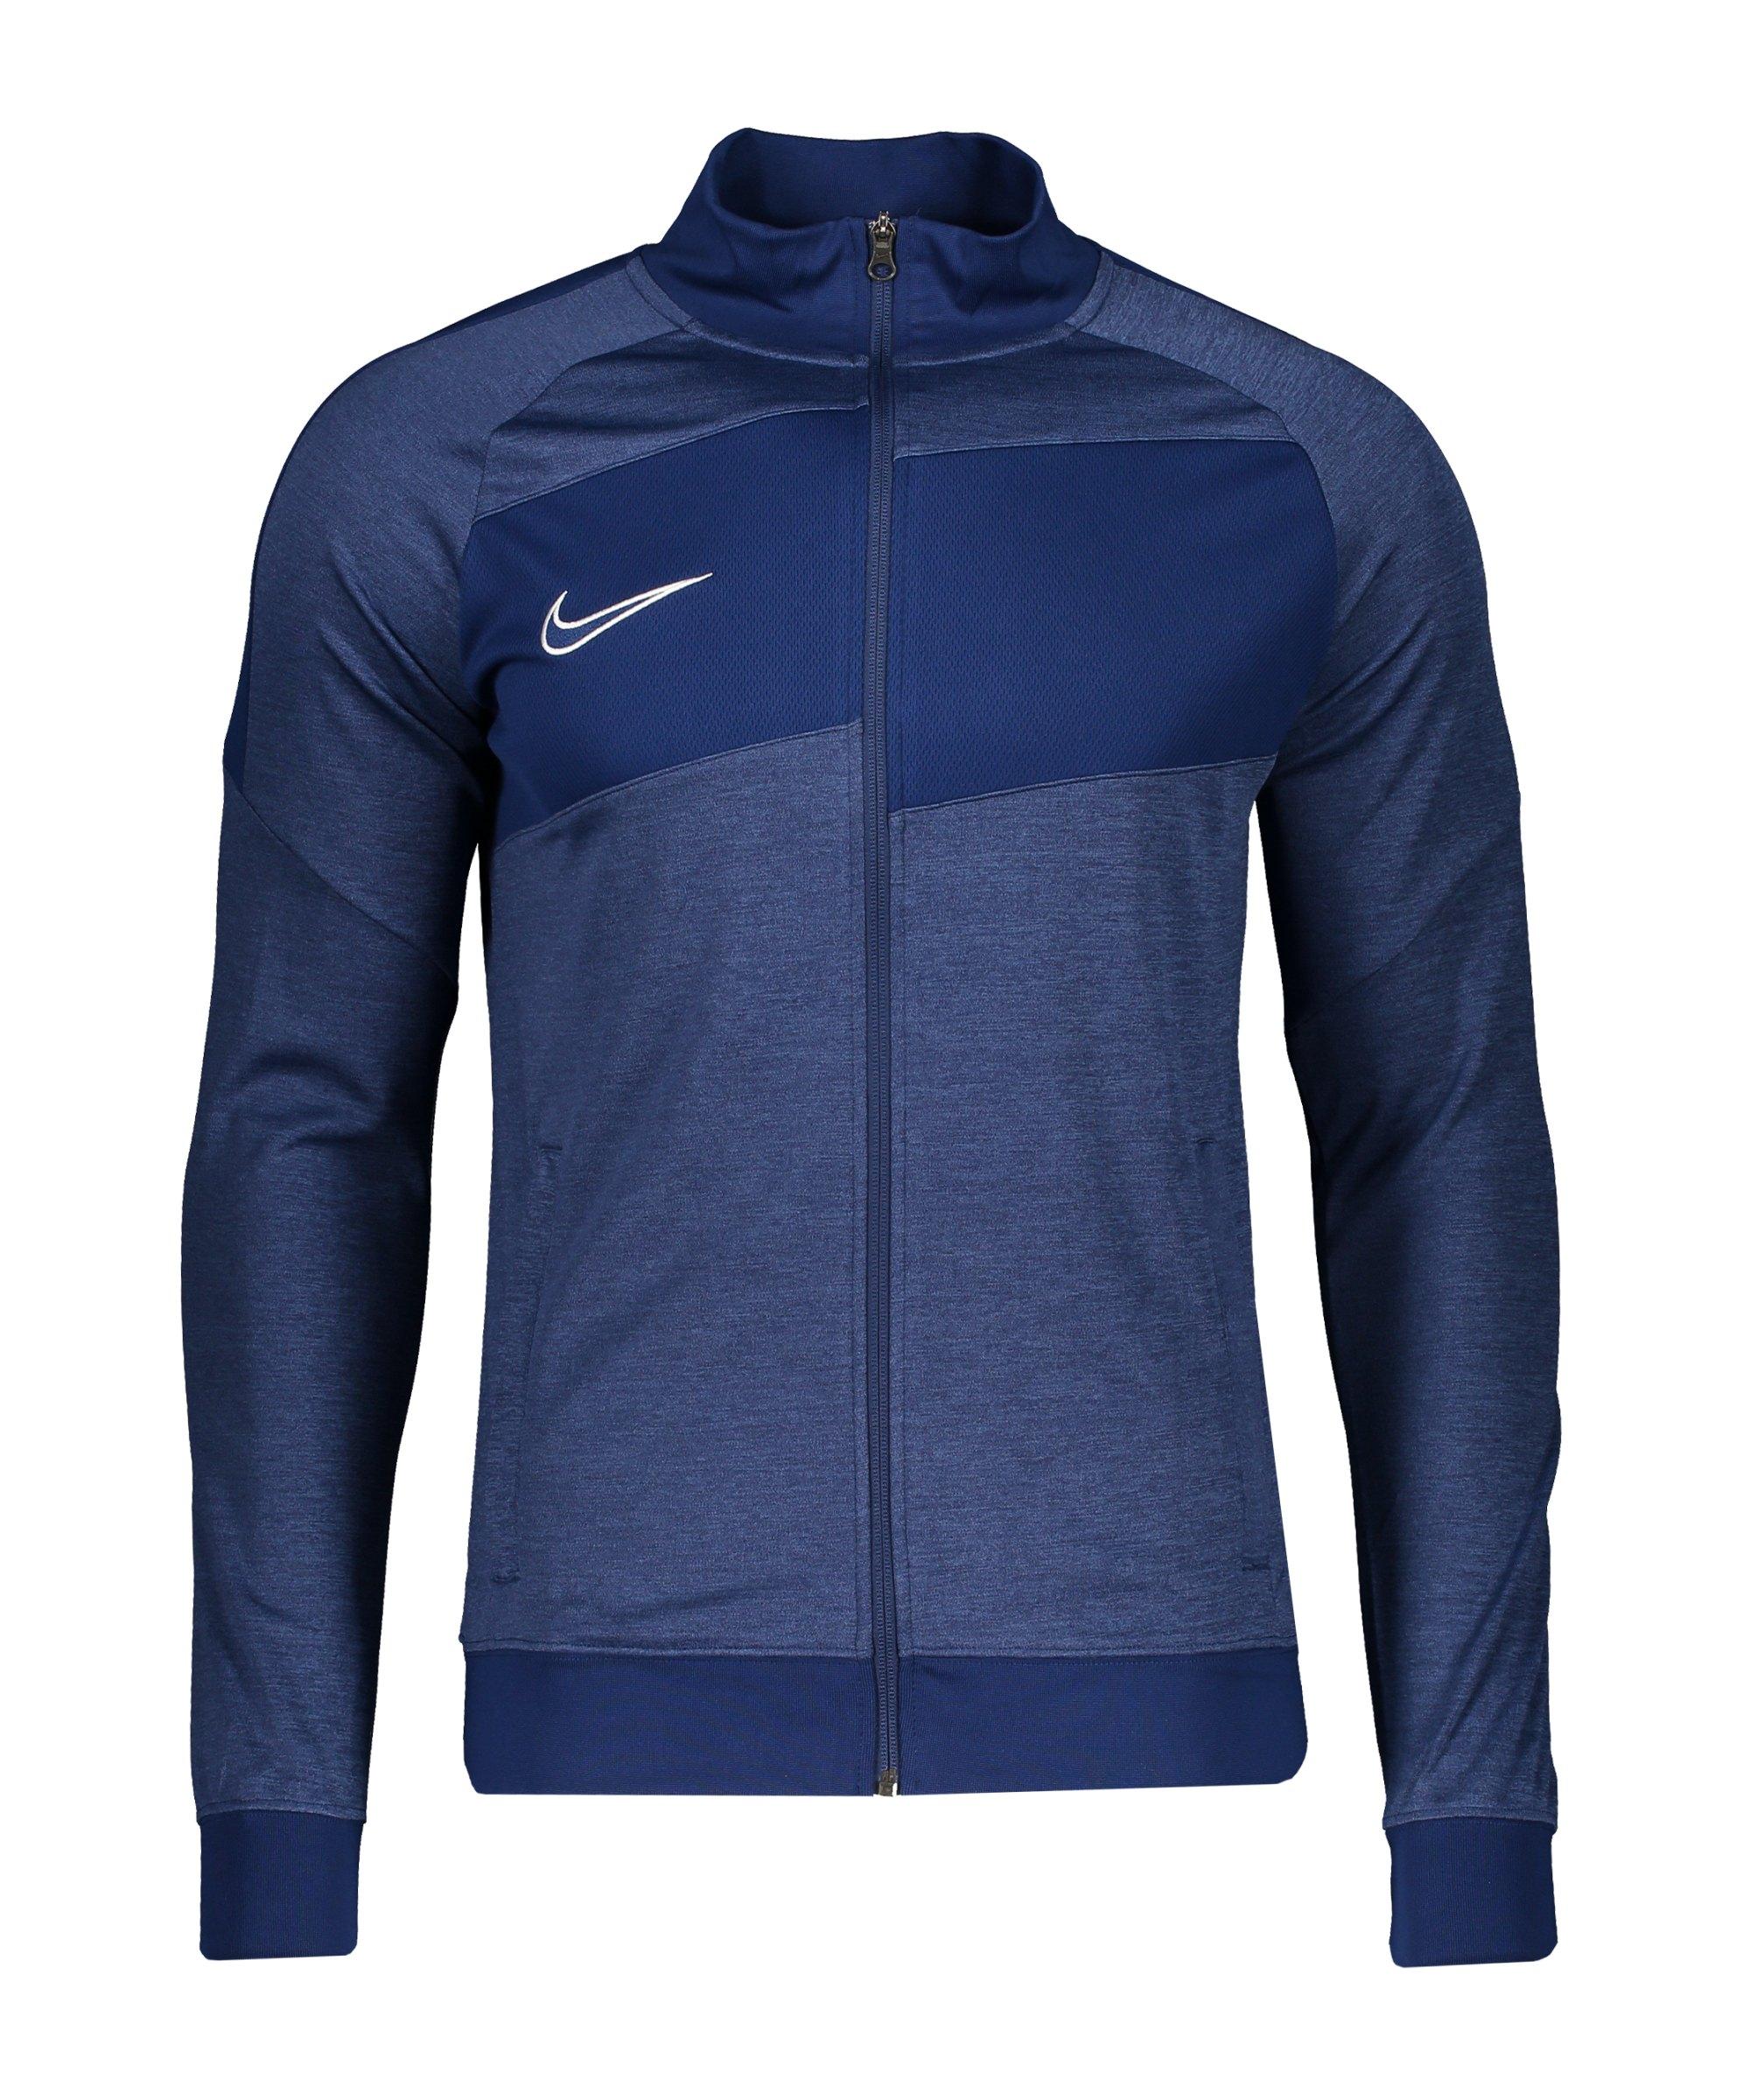 Nike Dry Academy I96 Trainingsjacke Blau F492 - blau